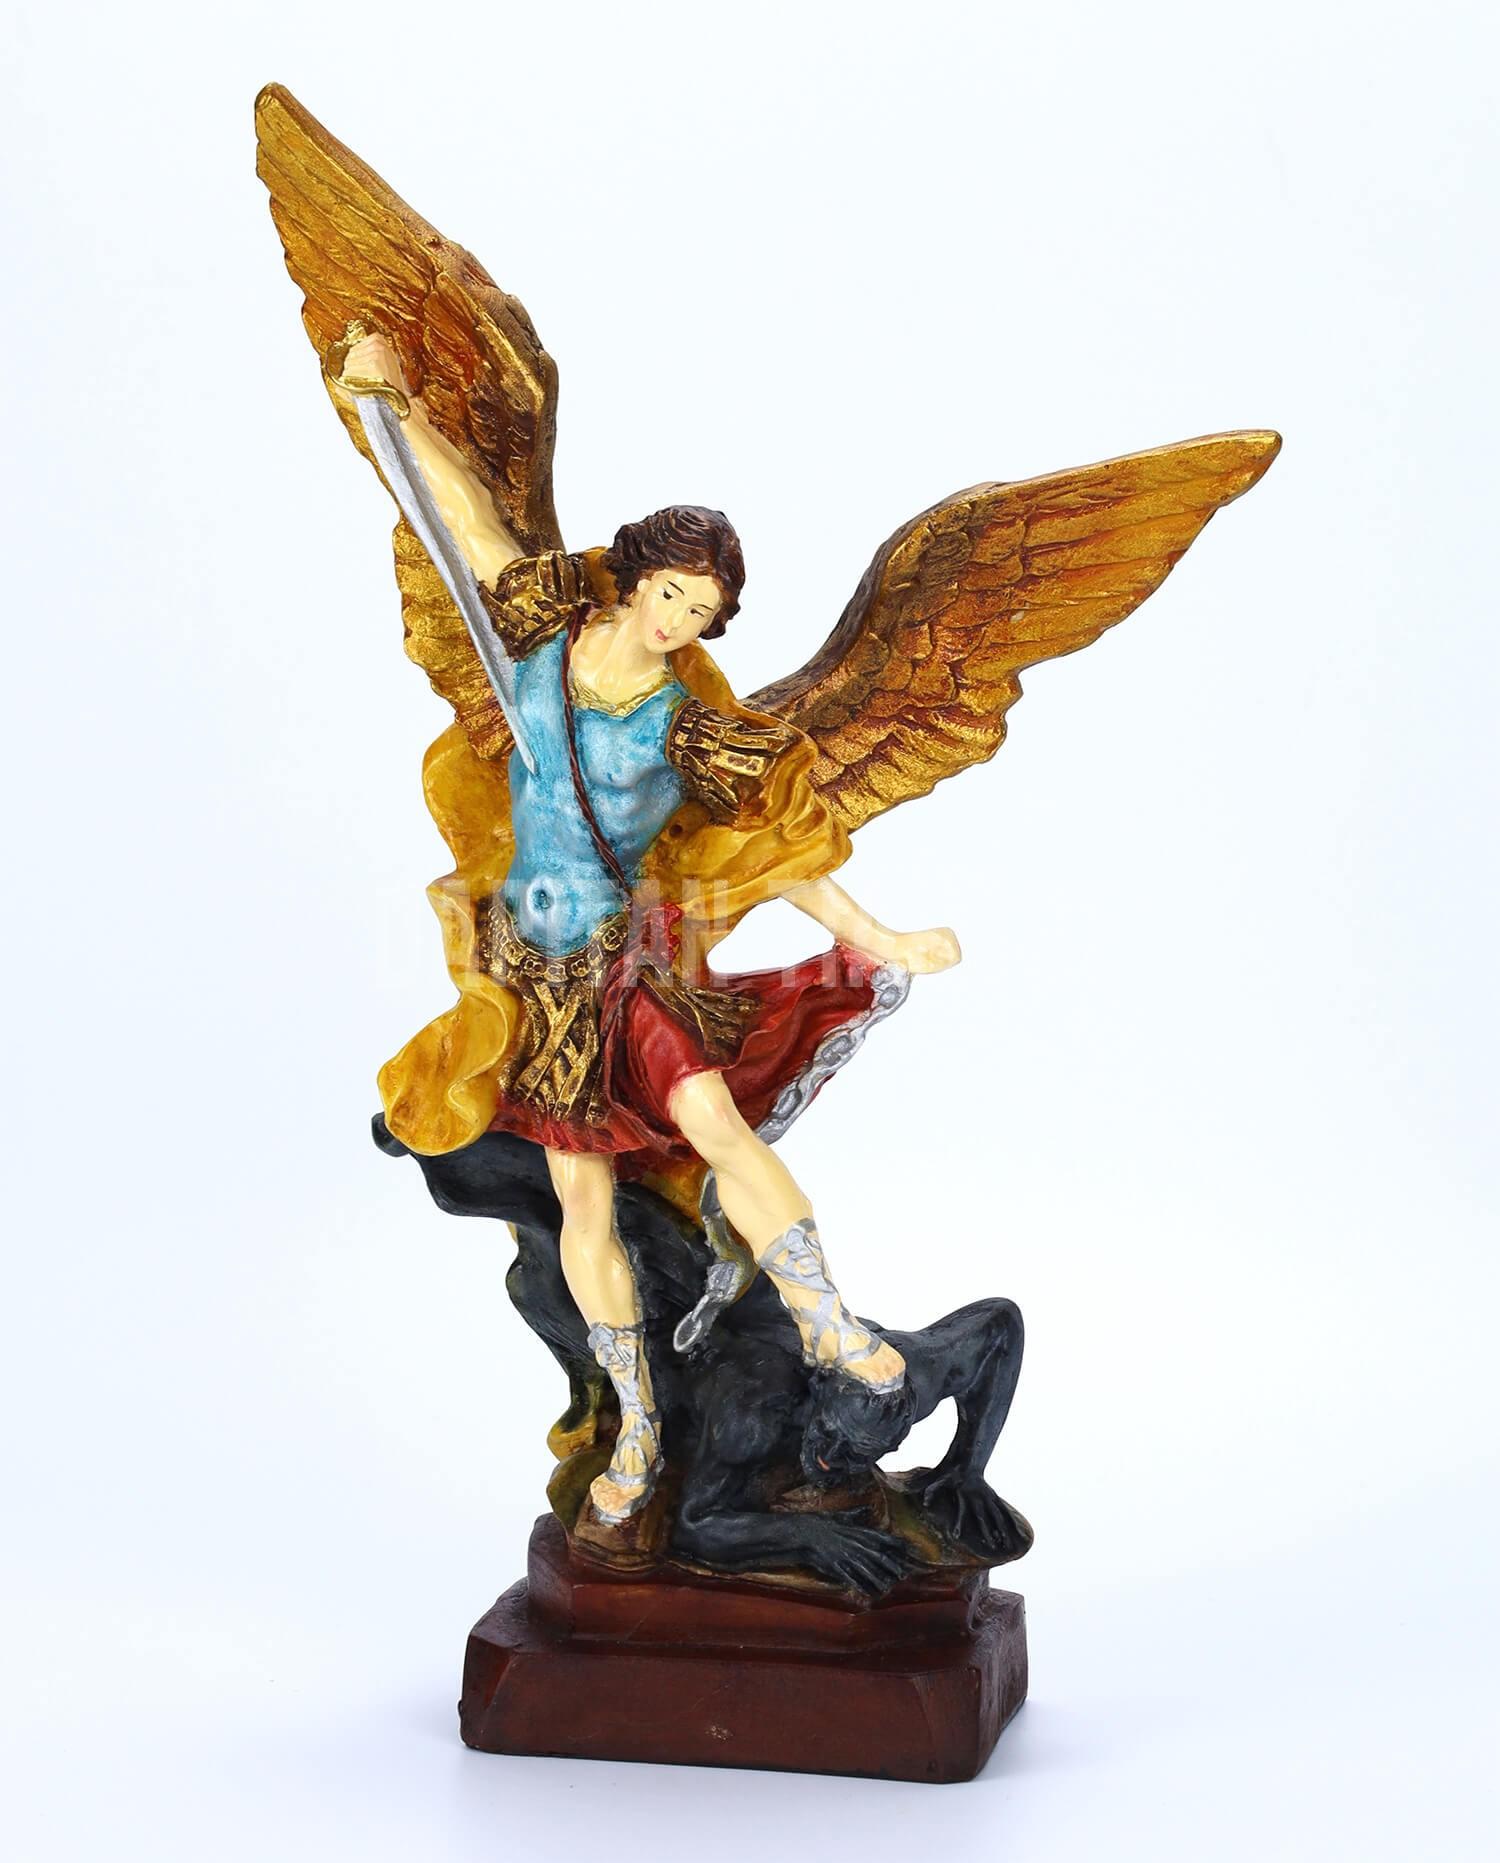 Dapitan Tiangge Archangel St. Michael Defeating Lucifer Gold Home Decor